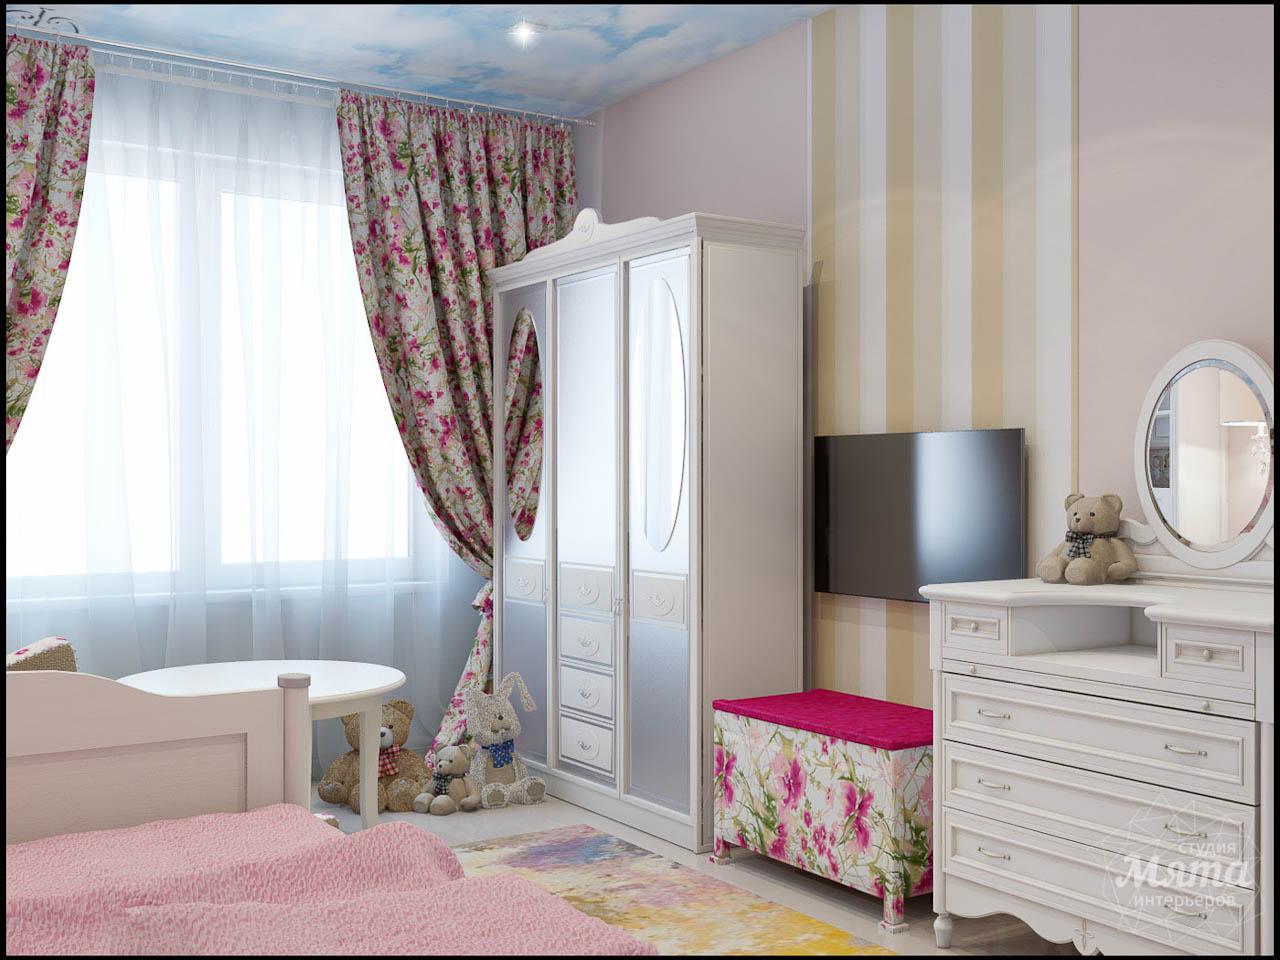 Дизайн интерьера и ремонт трехкомнатной квартиры по ул. 8 Марта 190 img1567109318